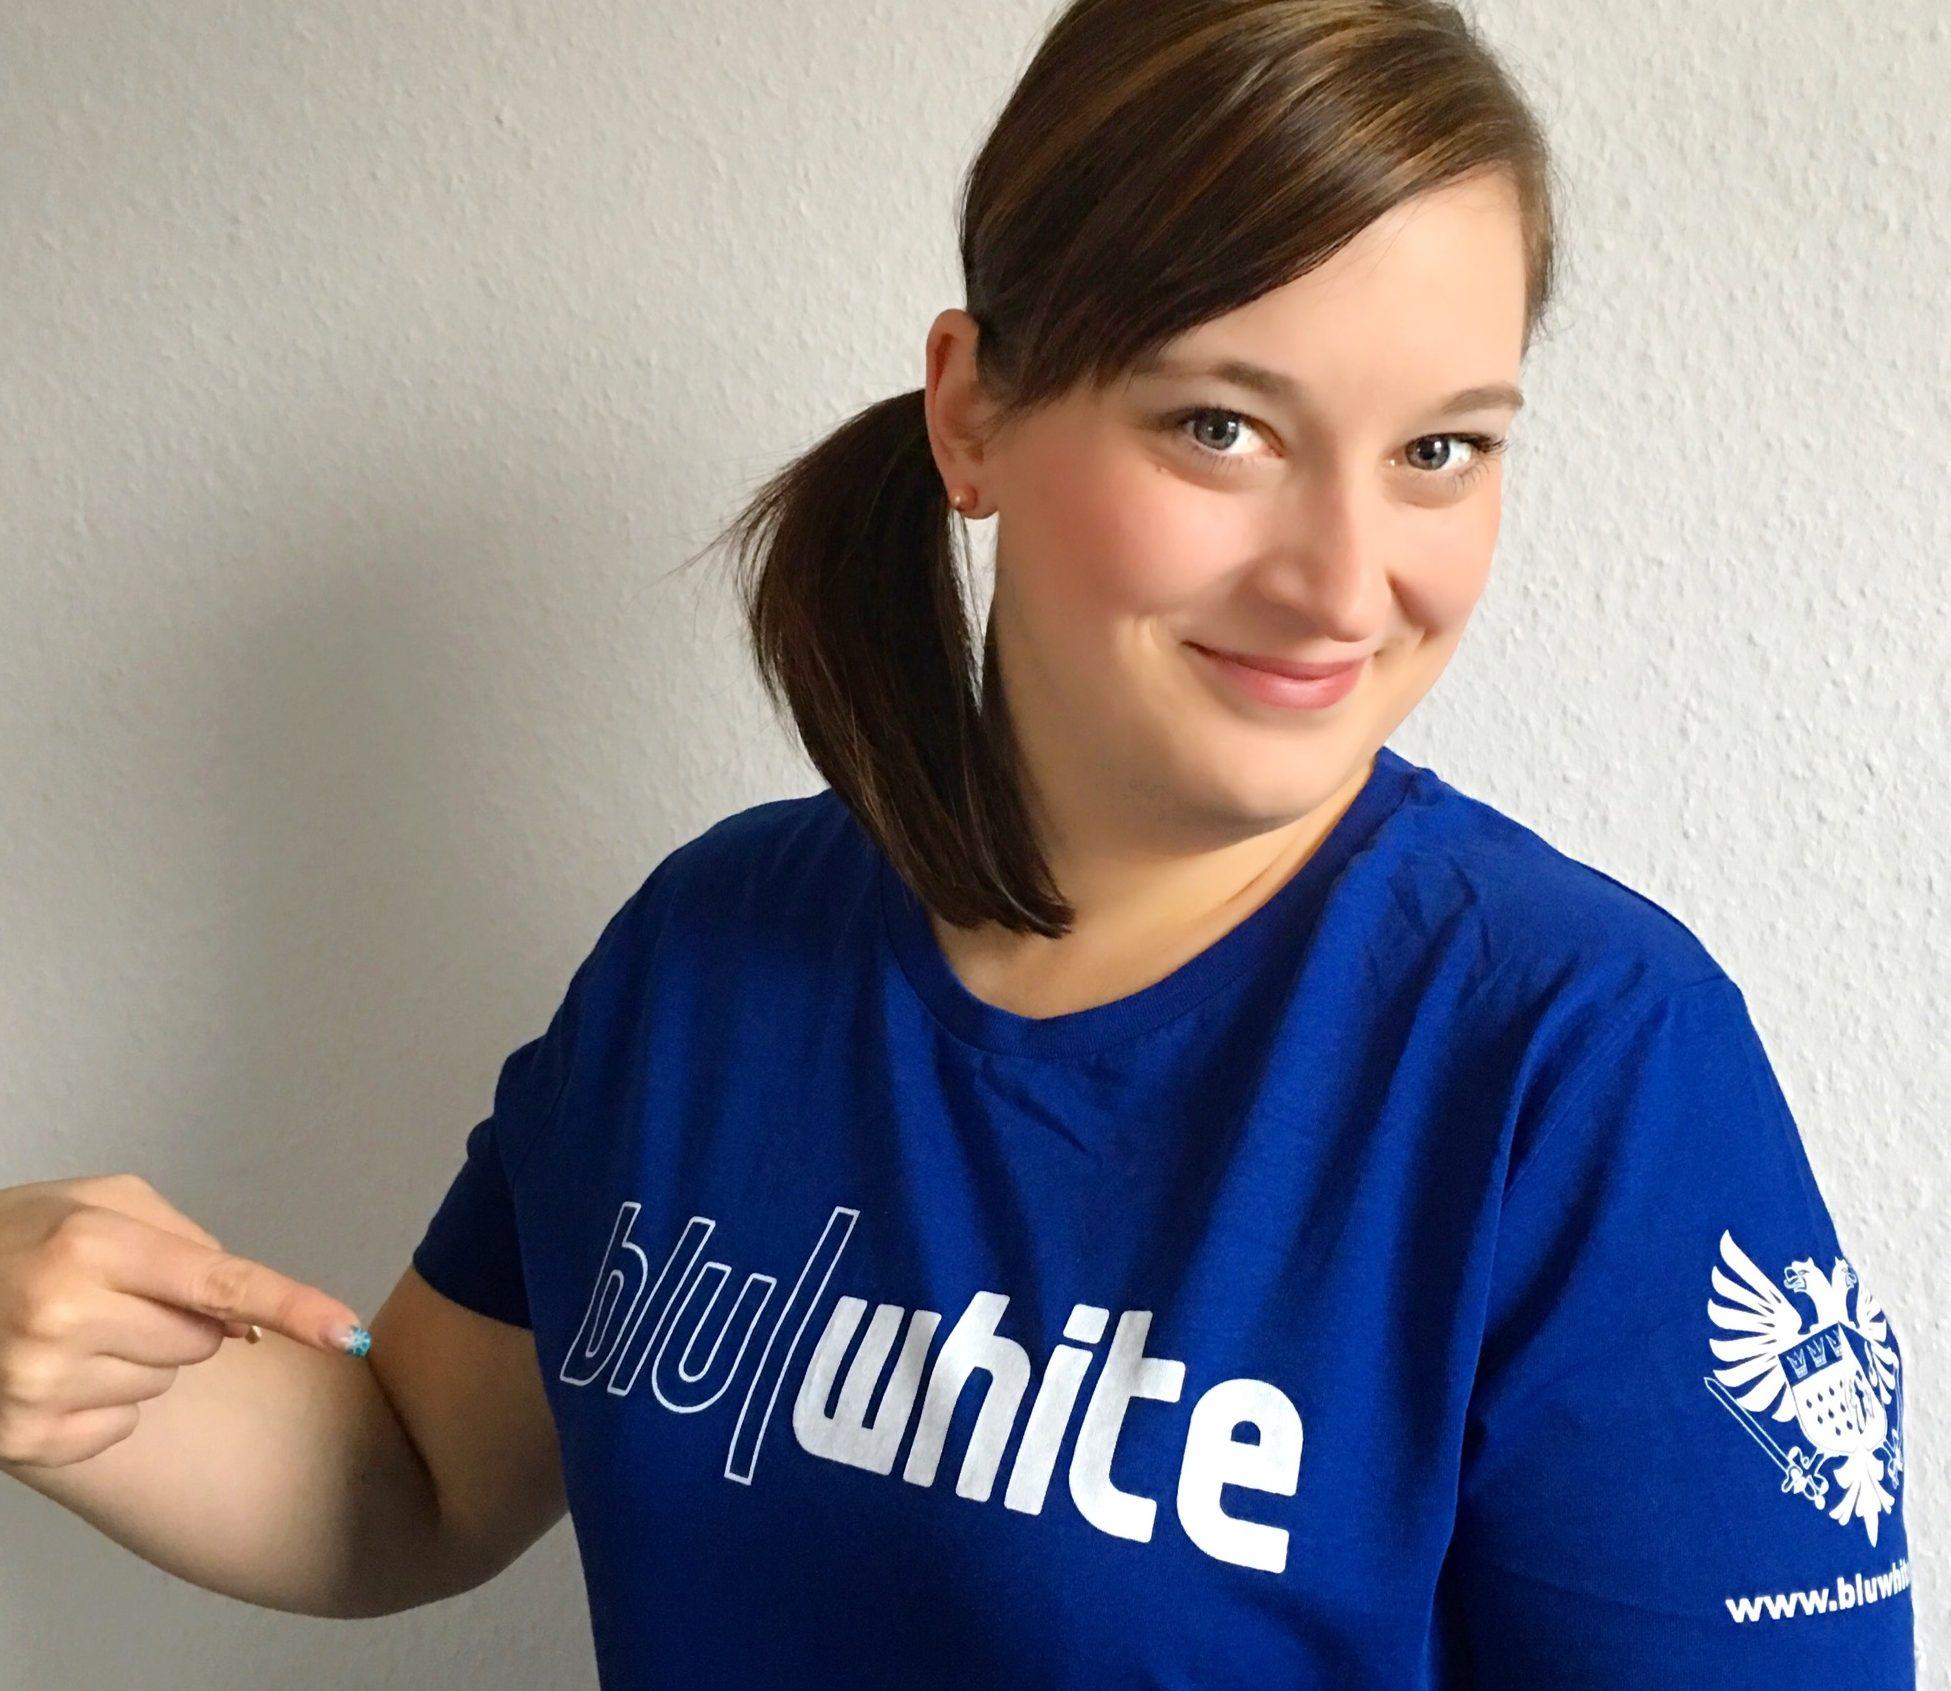 Liebe Sarah BluWihte Shirt